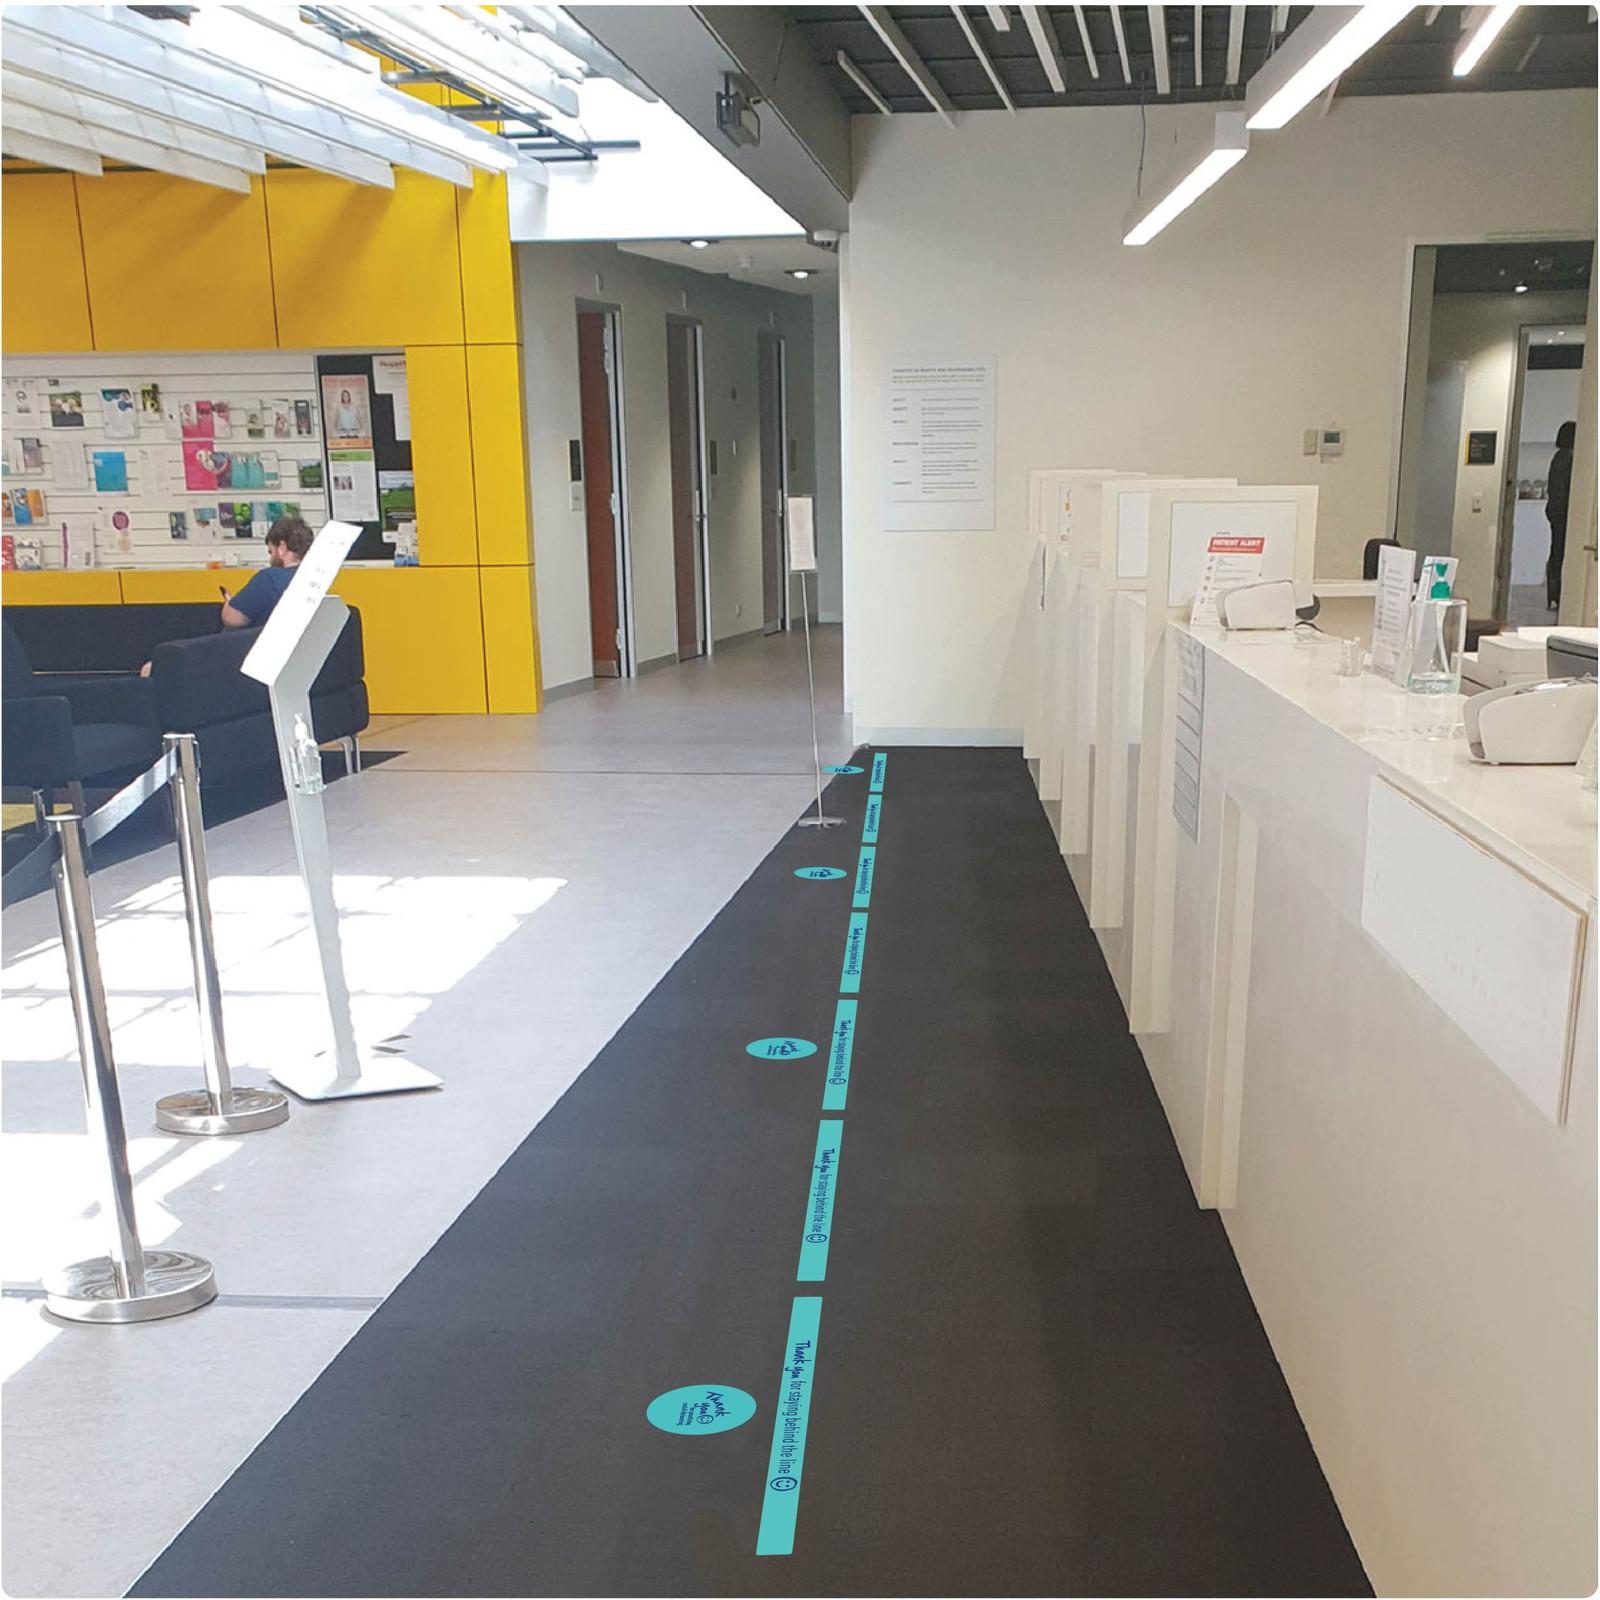 social distancing floor sticker for carpet, 2 lines, teal, photo Self-adhesive Corona virus floor sticker to help social distancing.